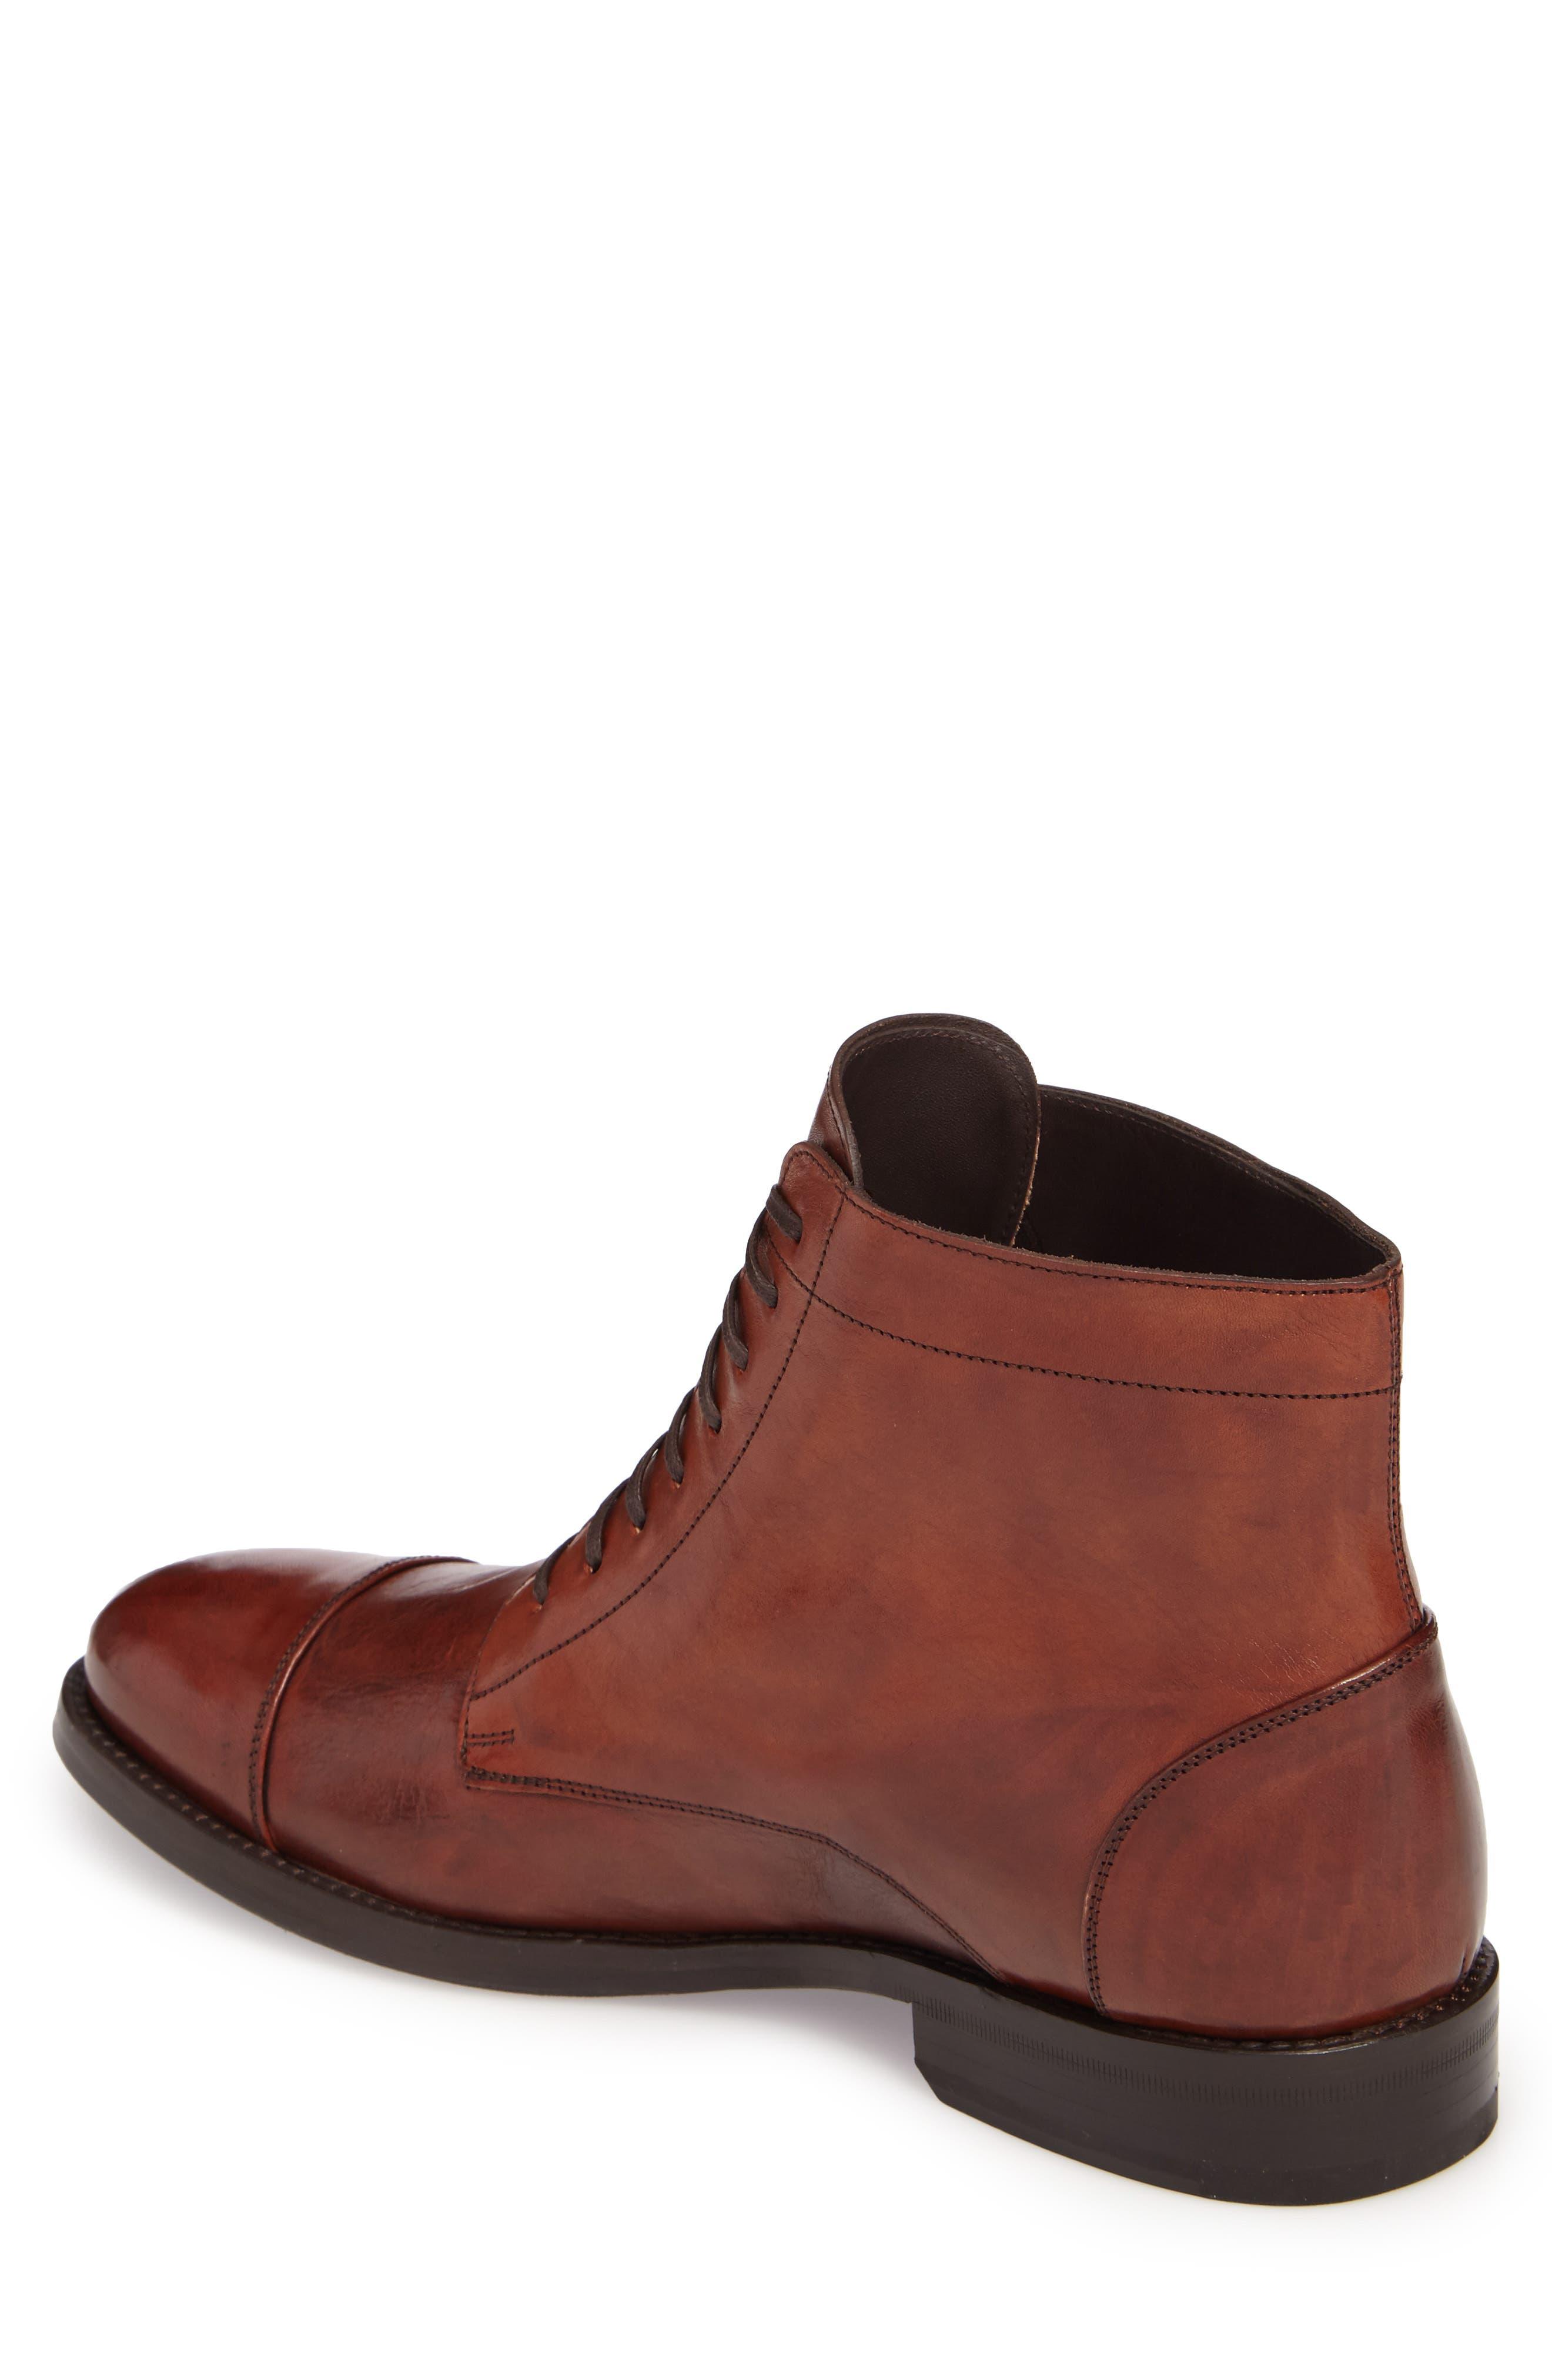 Alternate Image 2  - Maison Forte Murcie Cap Toe Boot (Men)